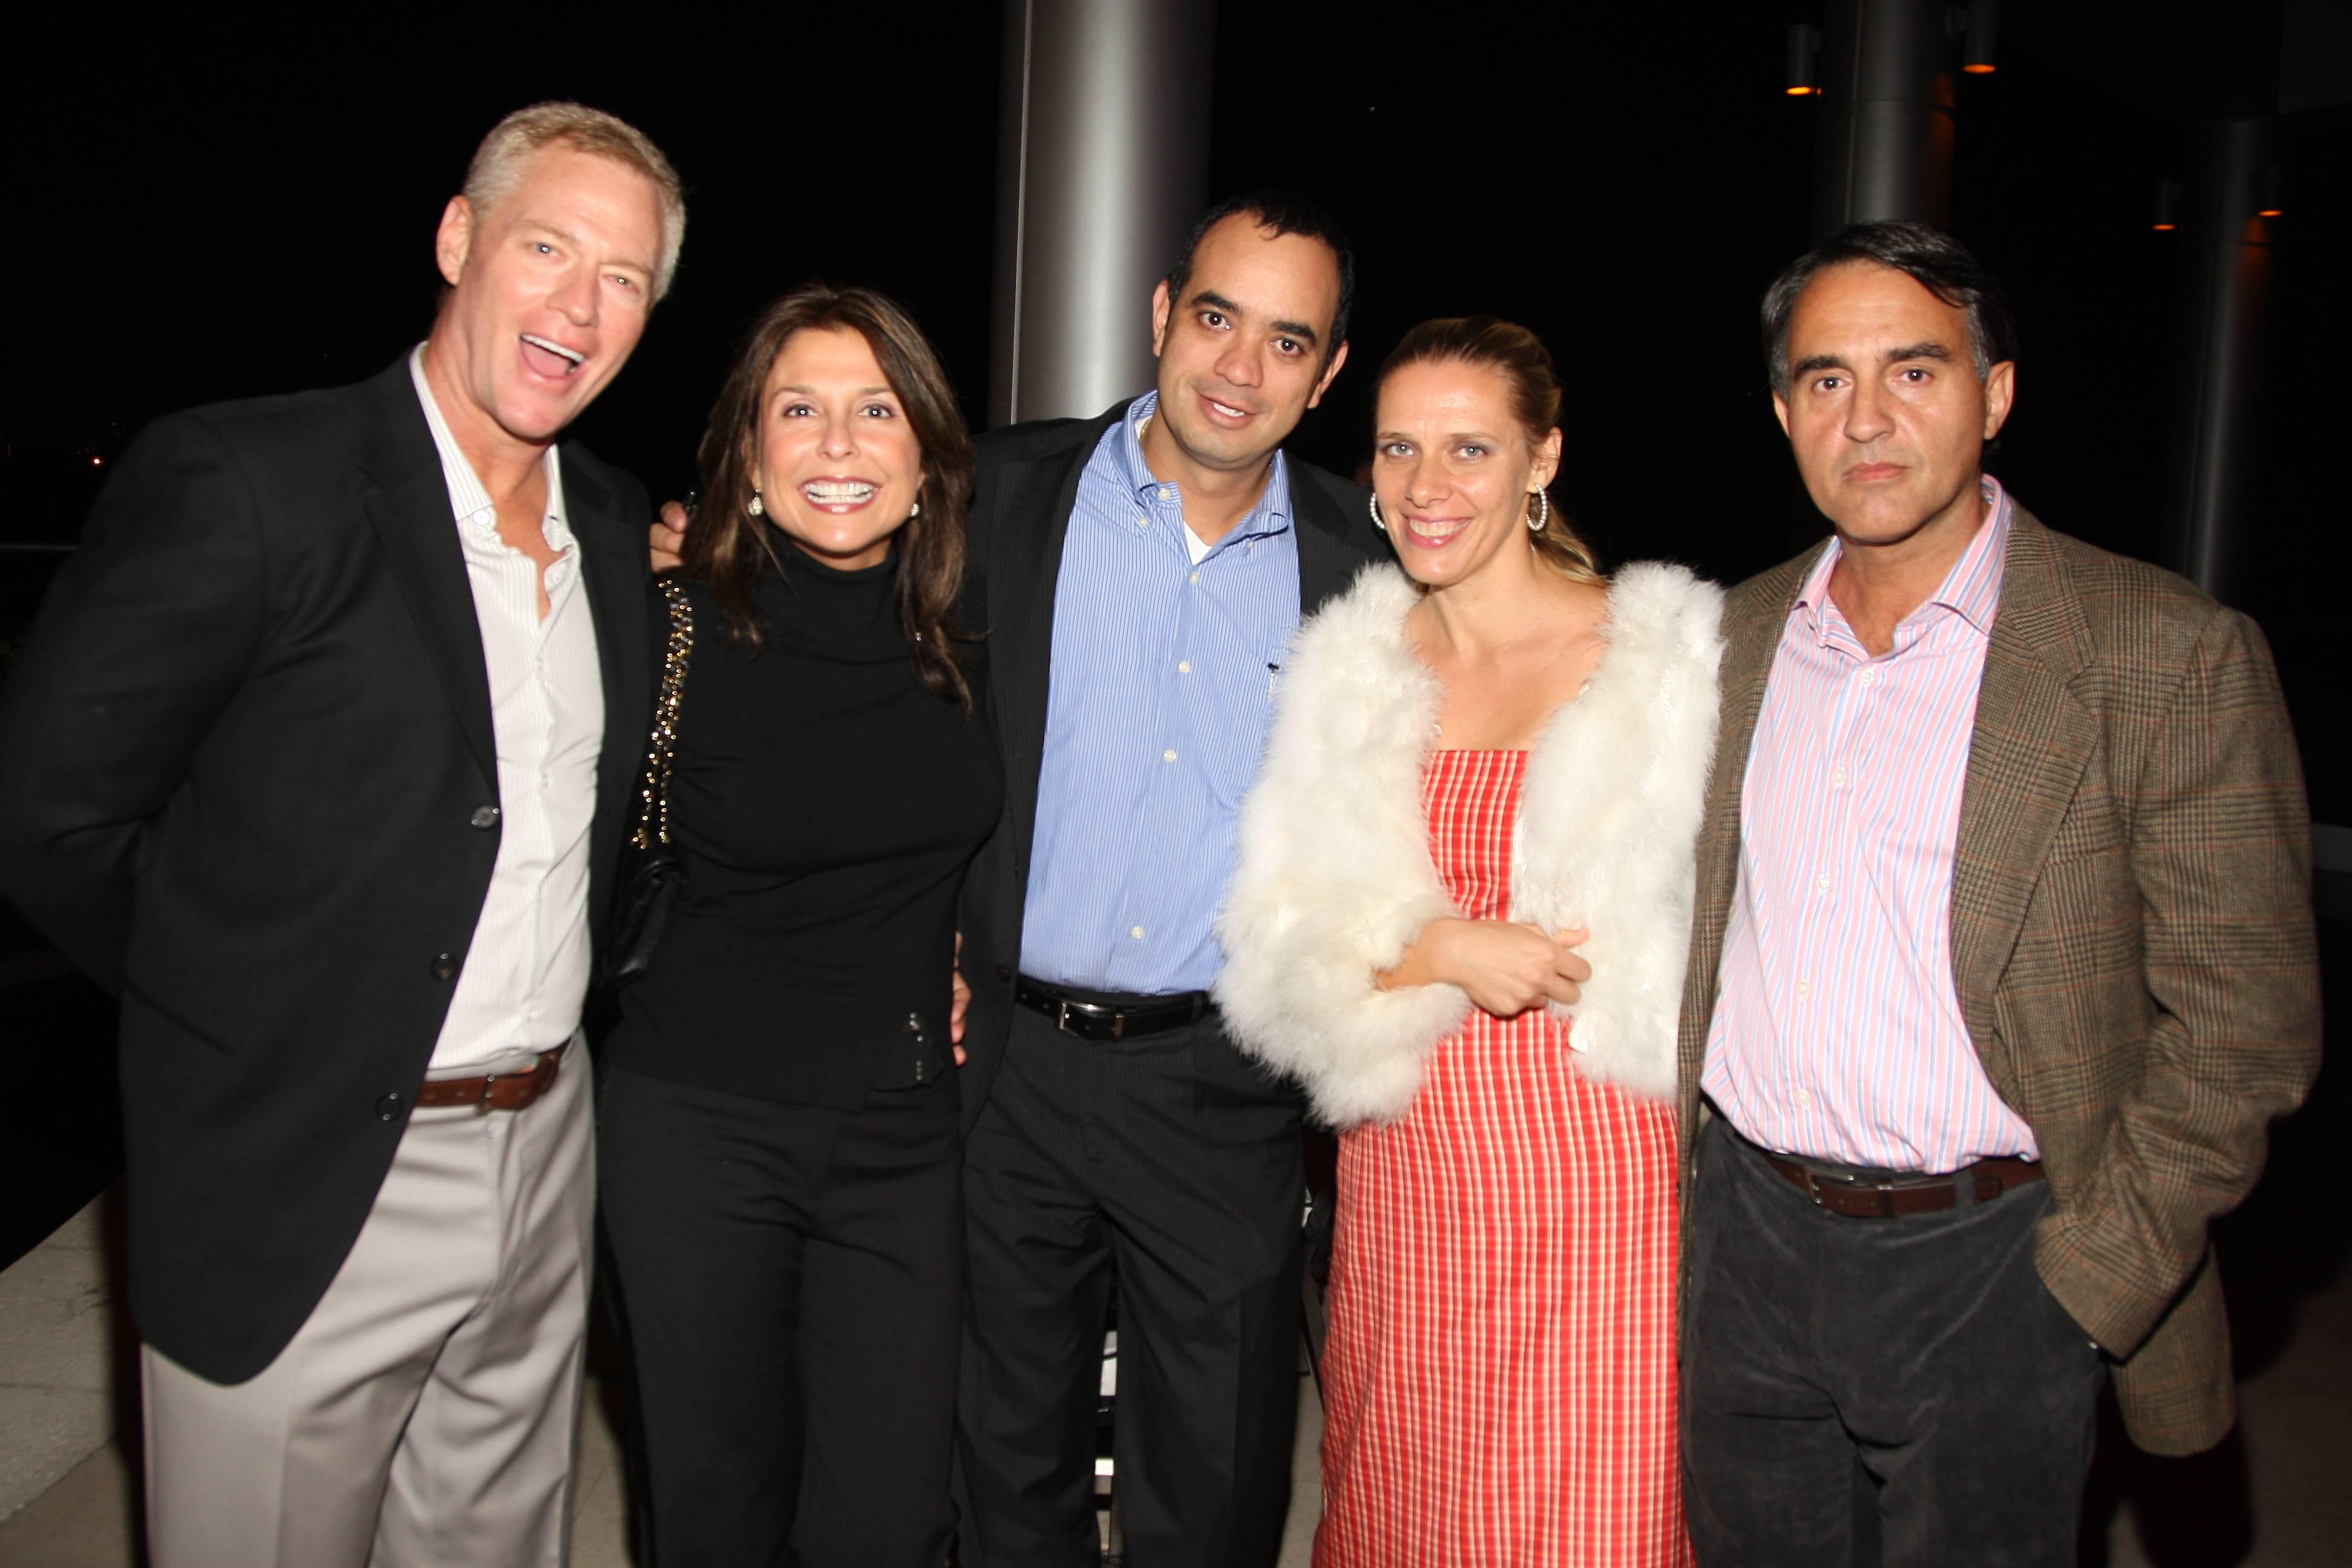 David Himmel, Ingrid Grad, Robert Allegria, Elena and Javier Valle (1)